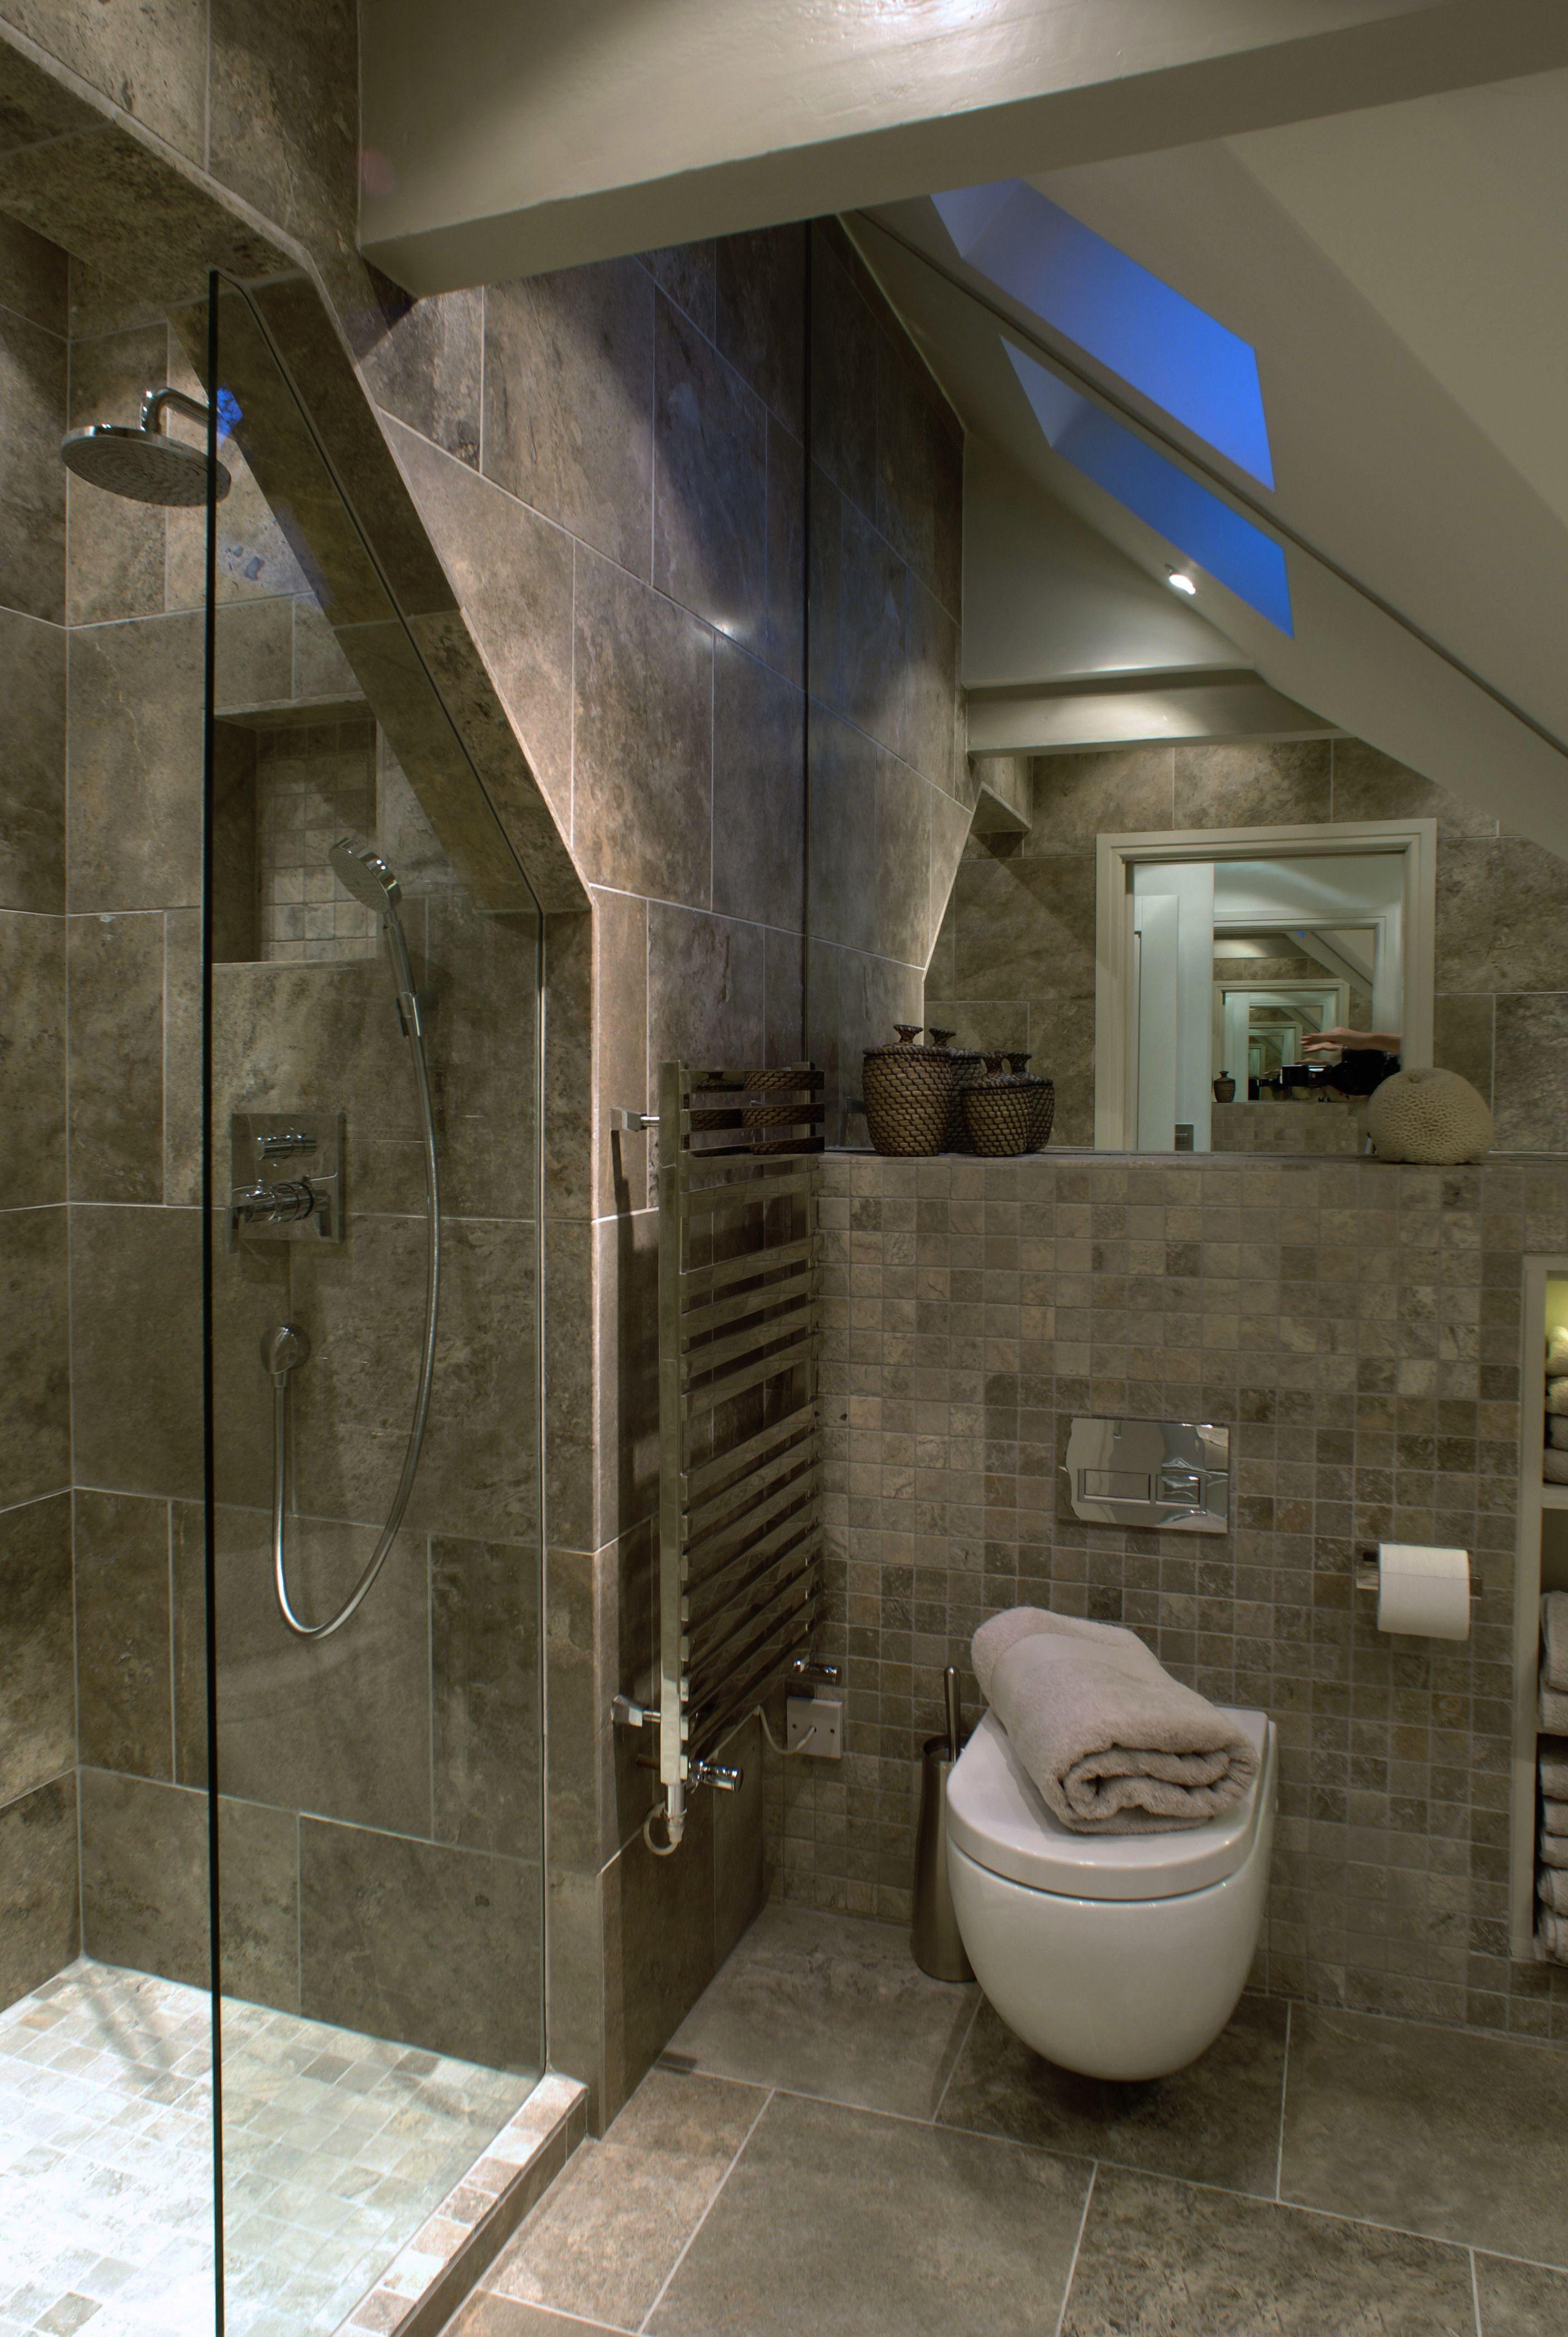 Bathroom Remodel Antioch Even Bathroom Ideas All White Bathroom Faucets Build Com Shower Room Ensuite Shower Room Bathroom Design